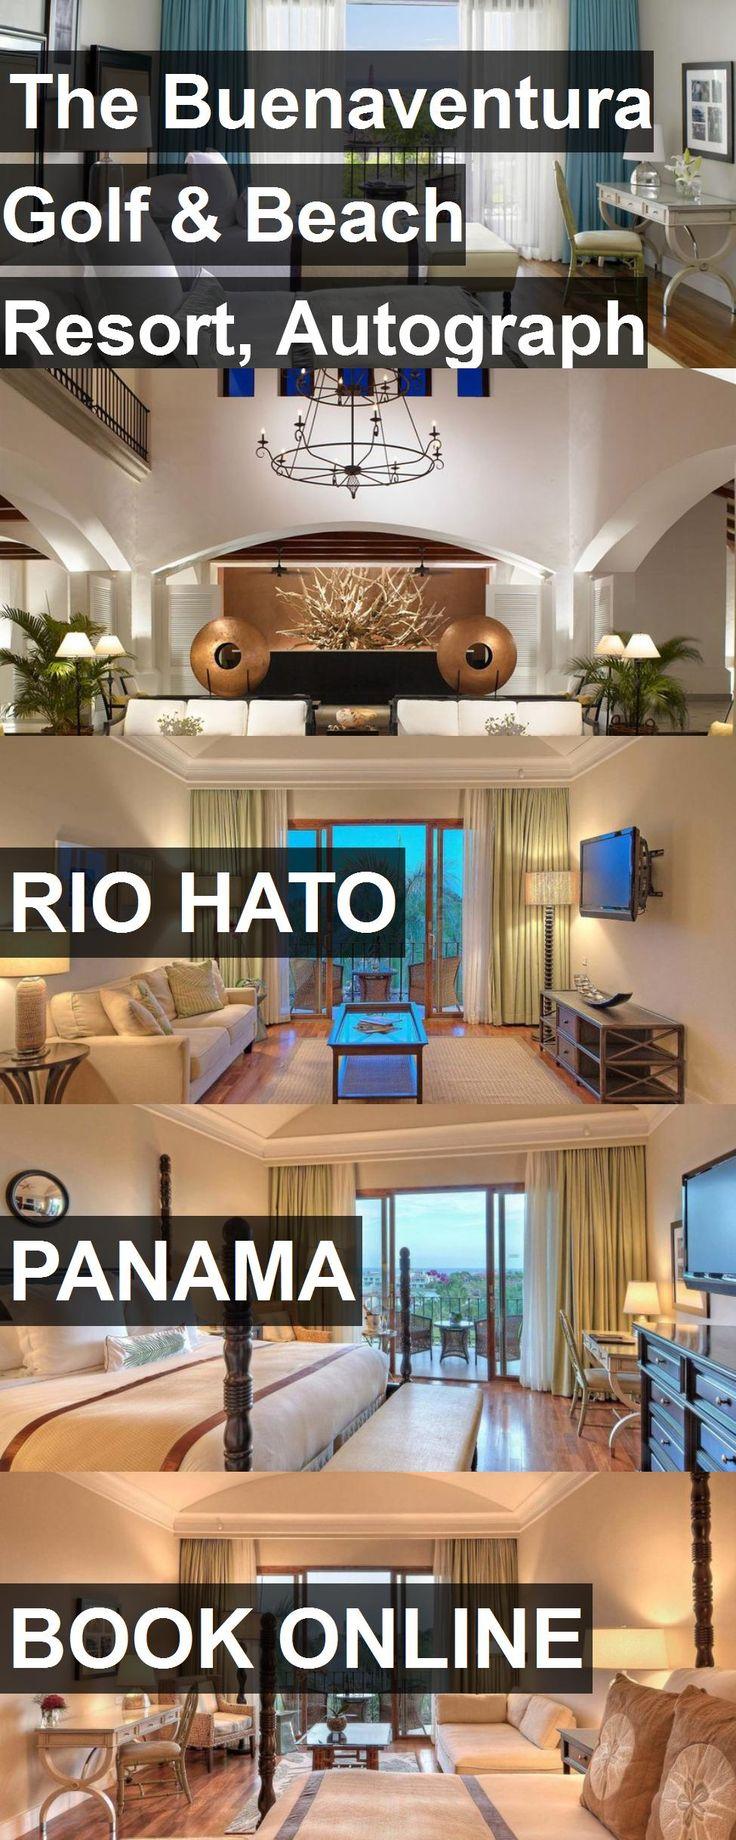 Hotel The Buenaventura Golf